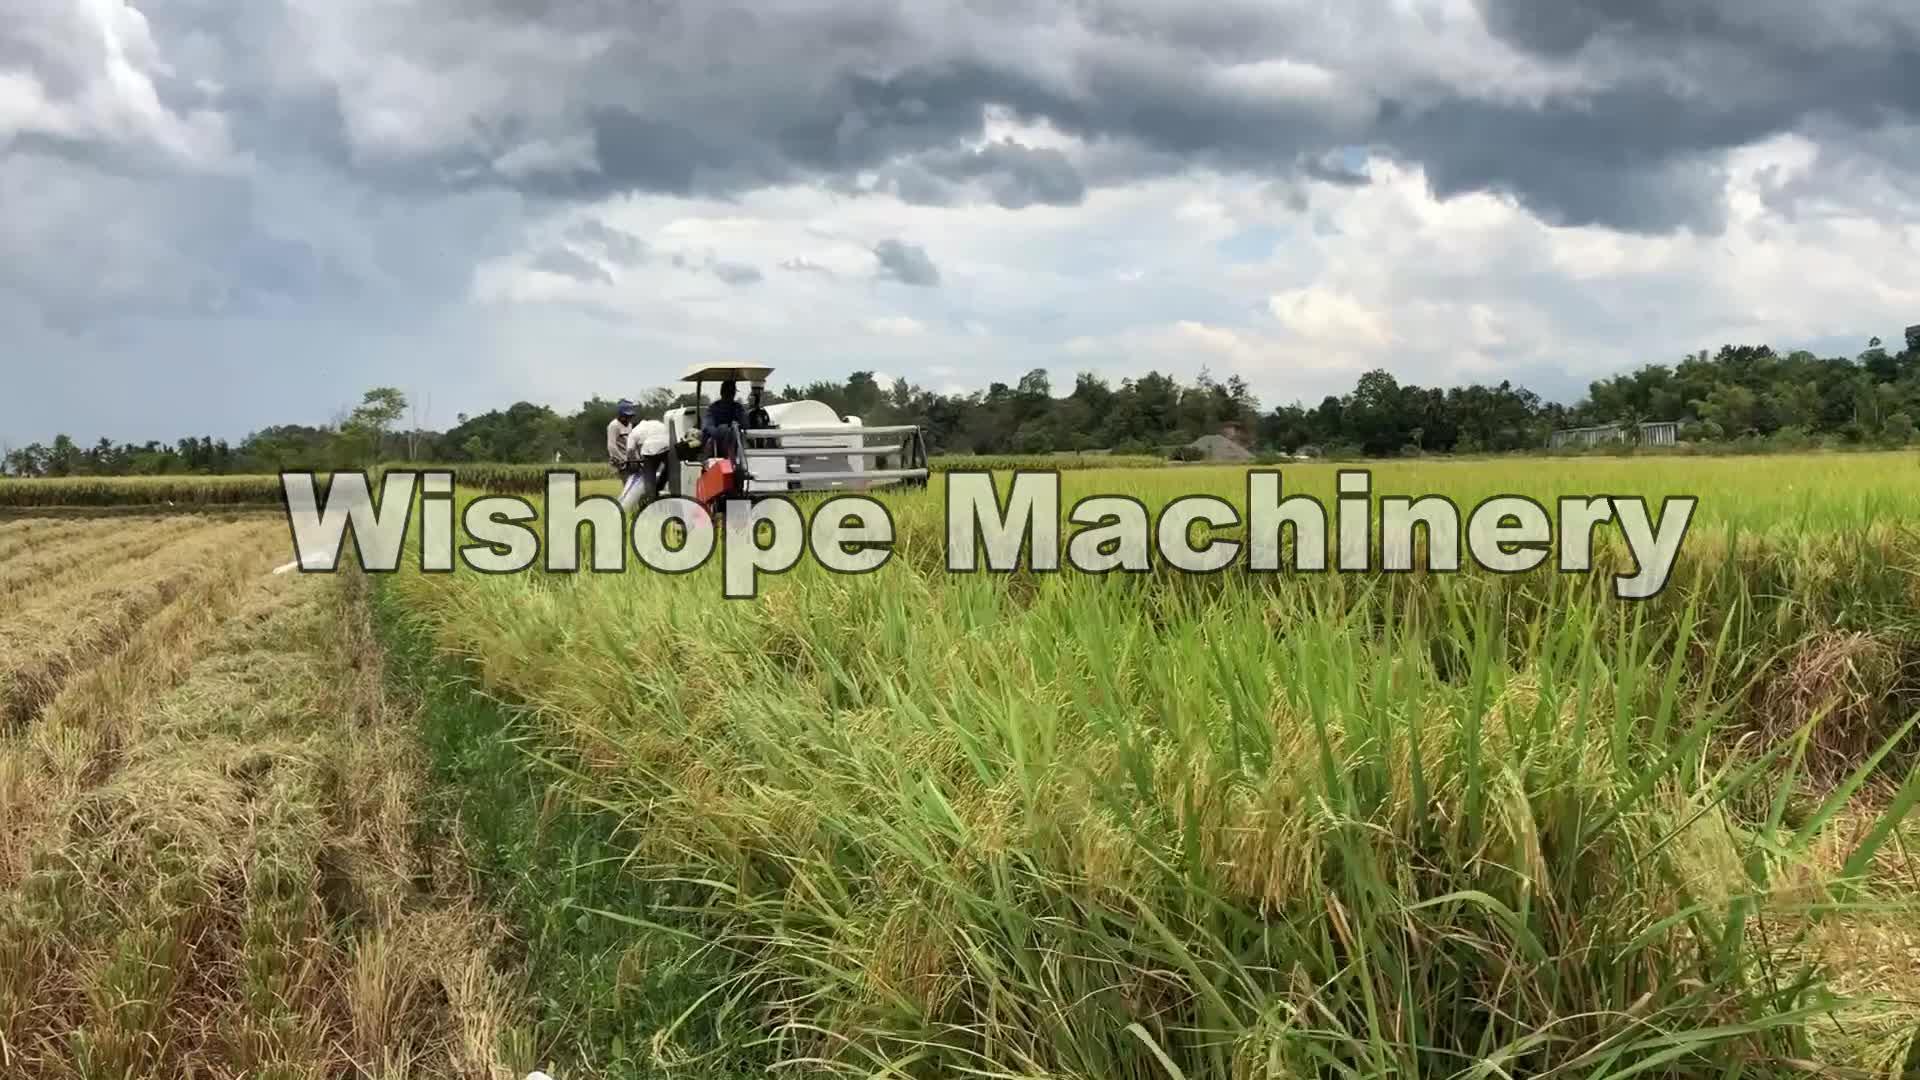 Kubota Type DC70 DC60 4LZ-4.5 Rice Combine Harvester For Sale